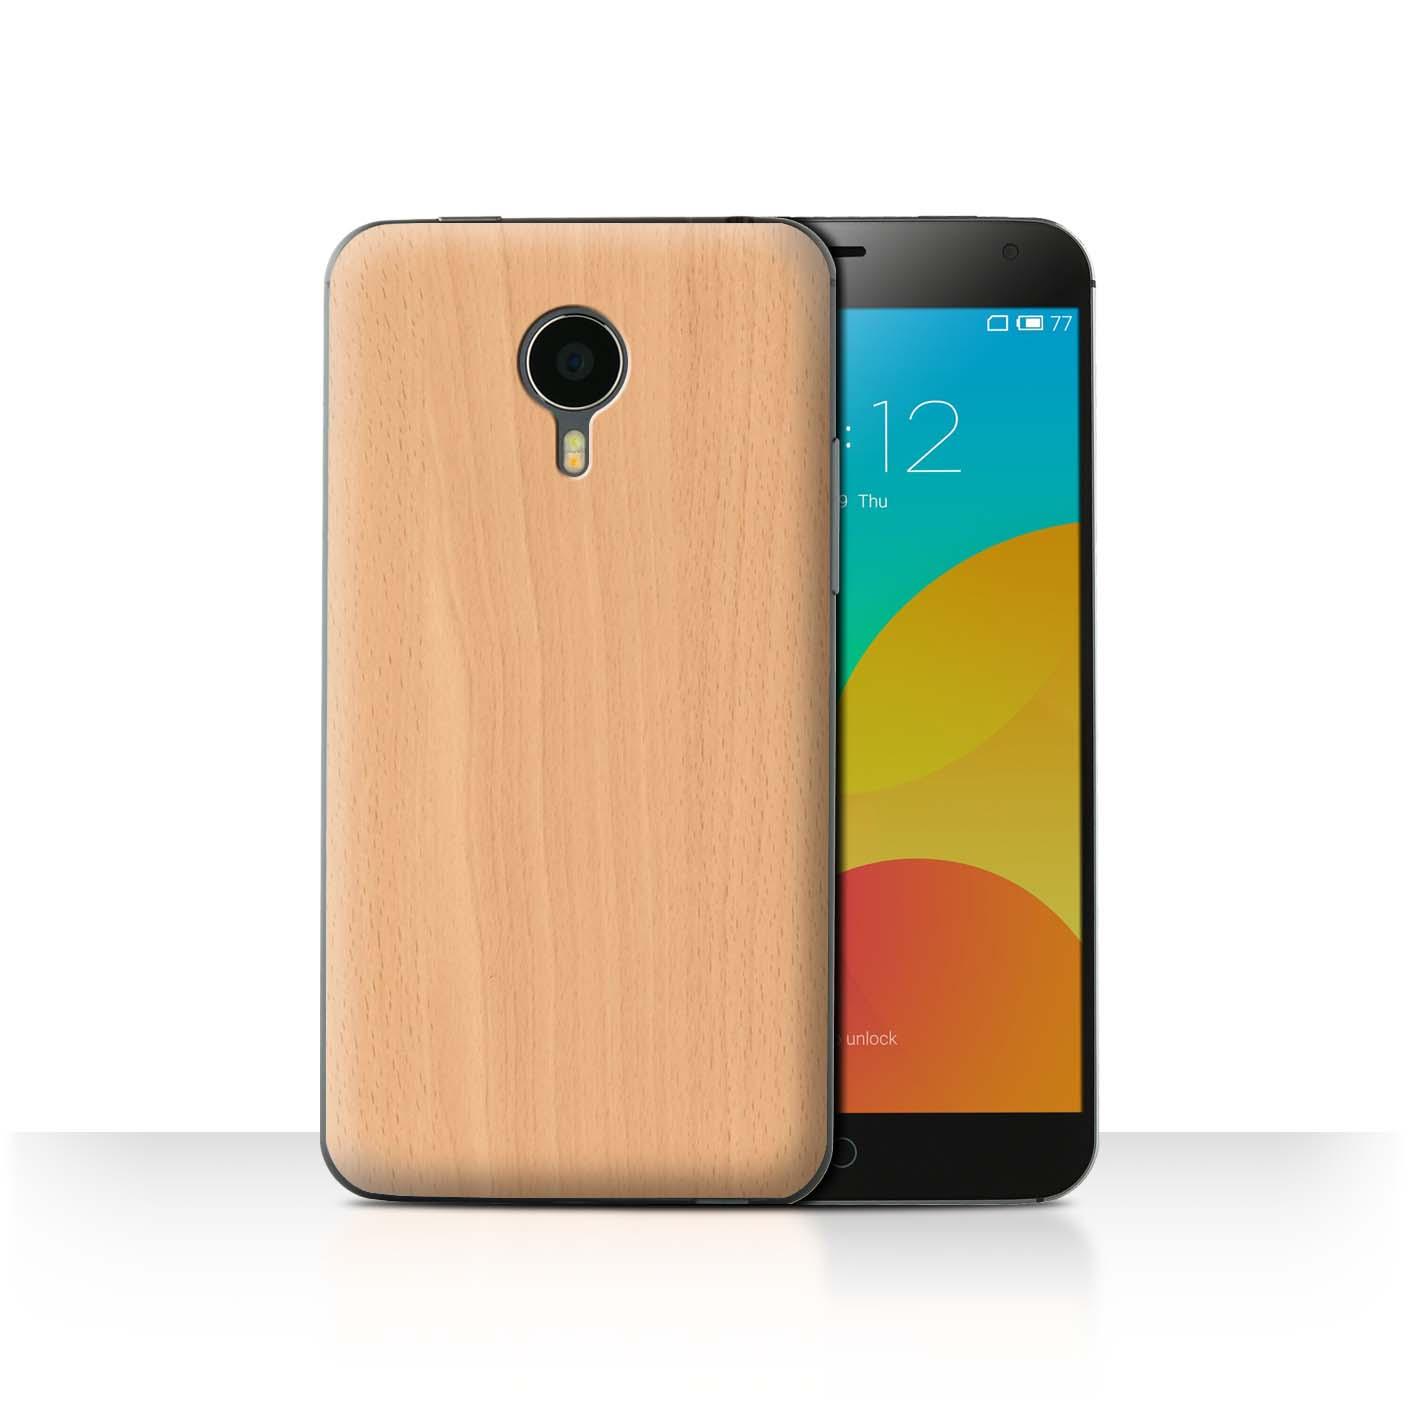 hot sale online 944ba 97b74 Details about STUFF4 Phone Case/Back Cover for Meizu MX4 /Wood Grain  Effect/Pattern